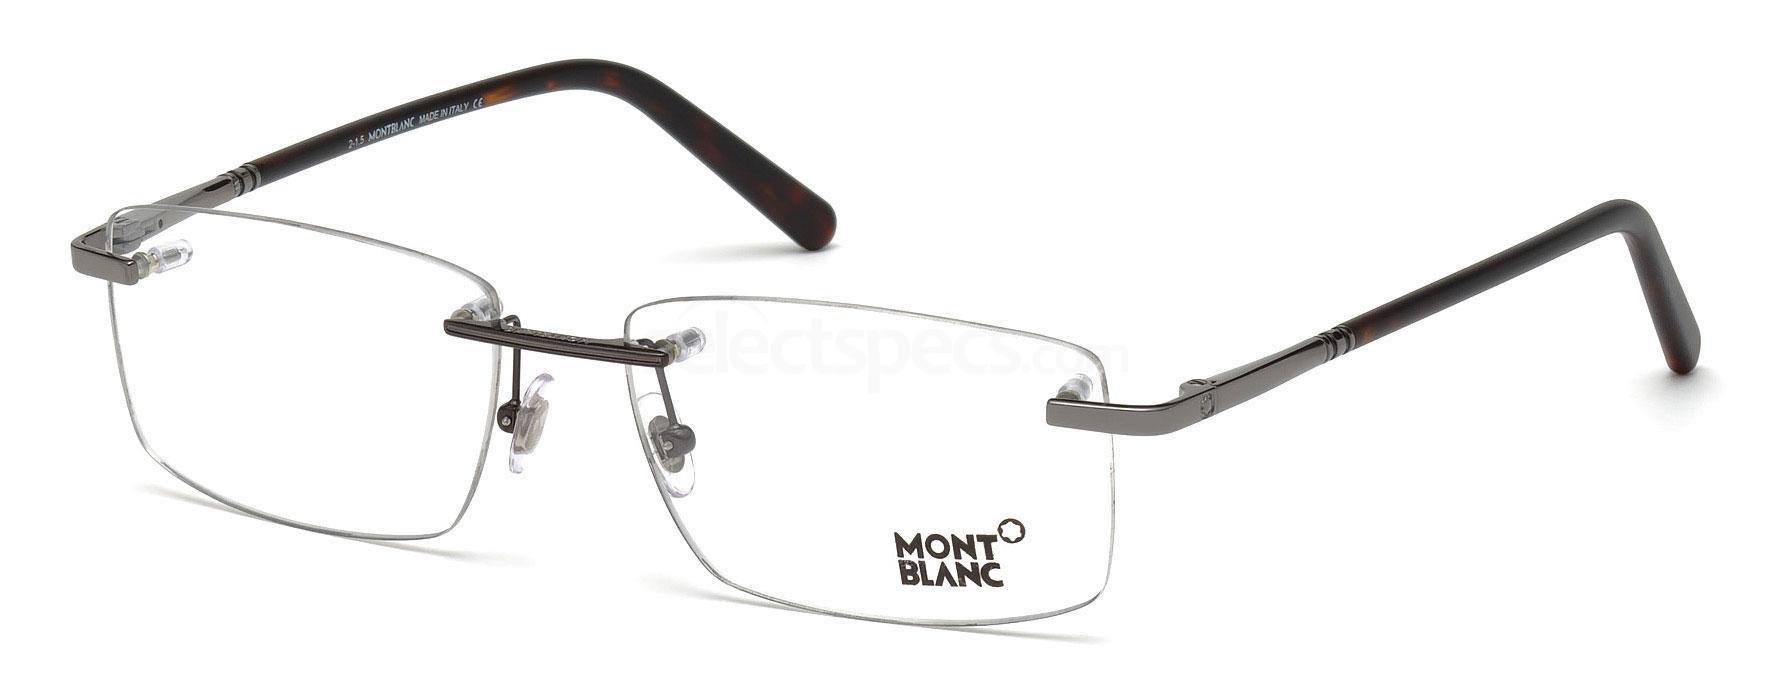 008 MB0579 , Mont Blanc